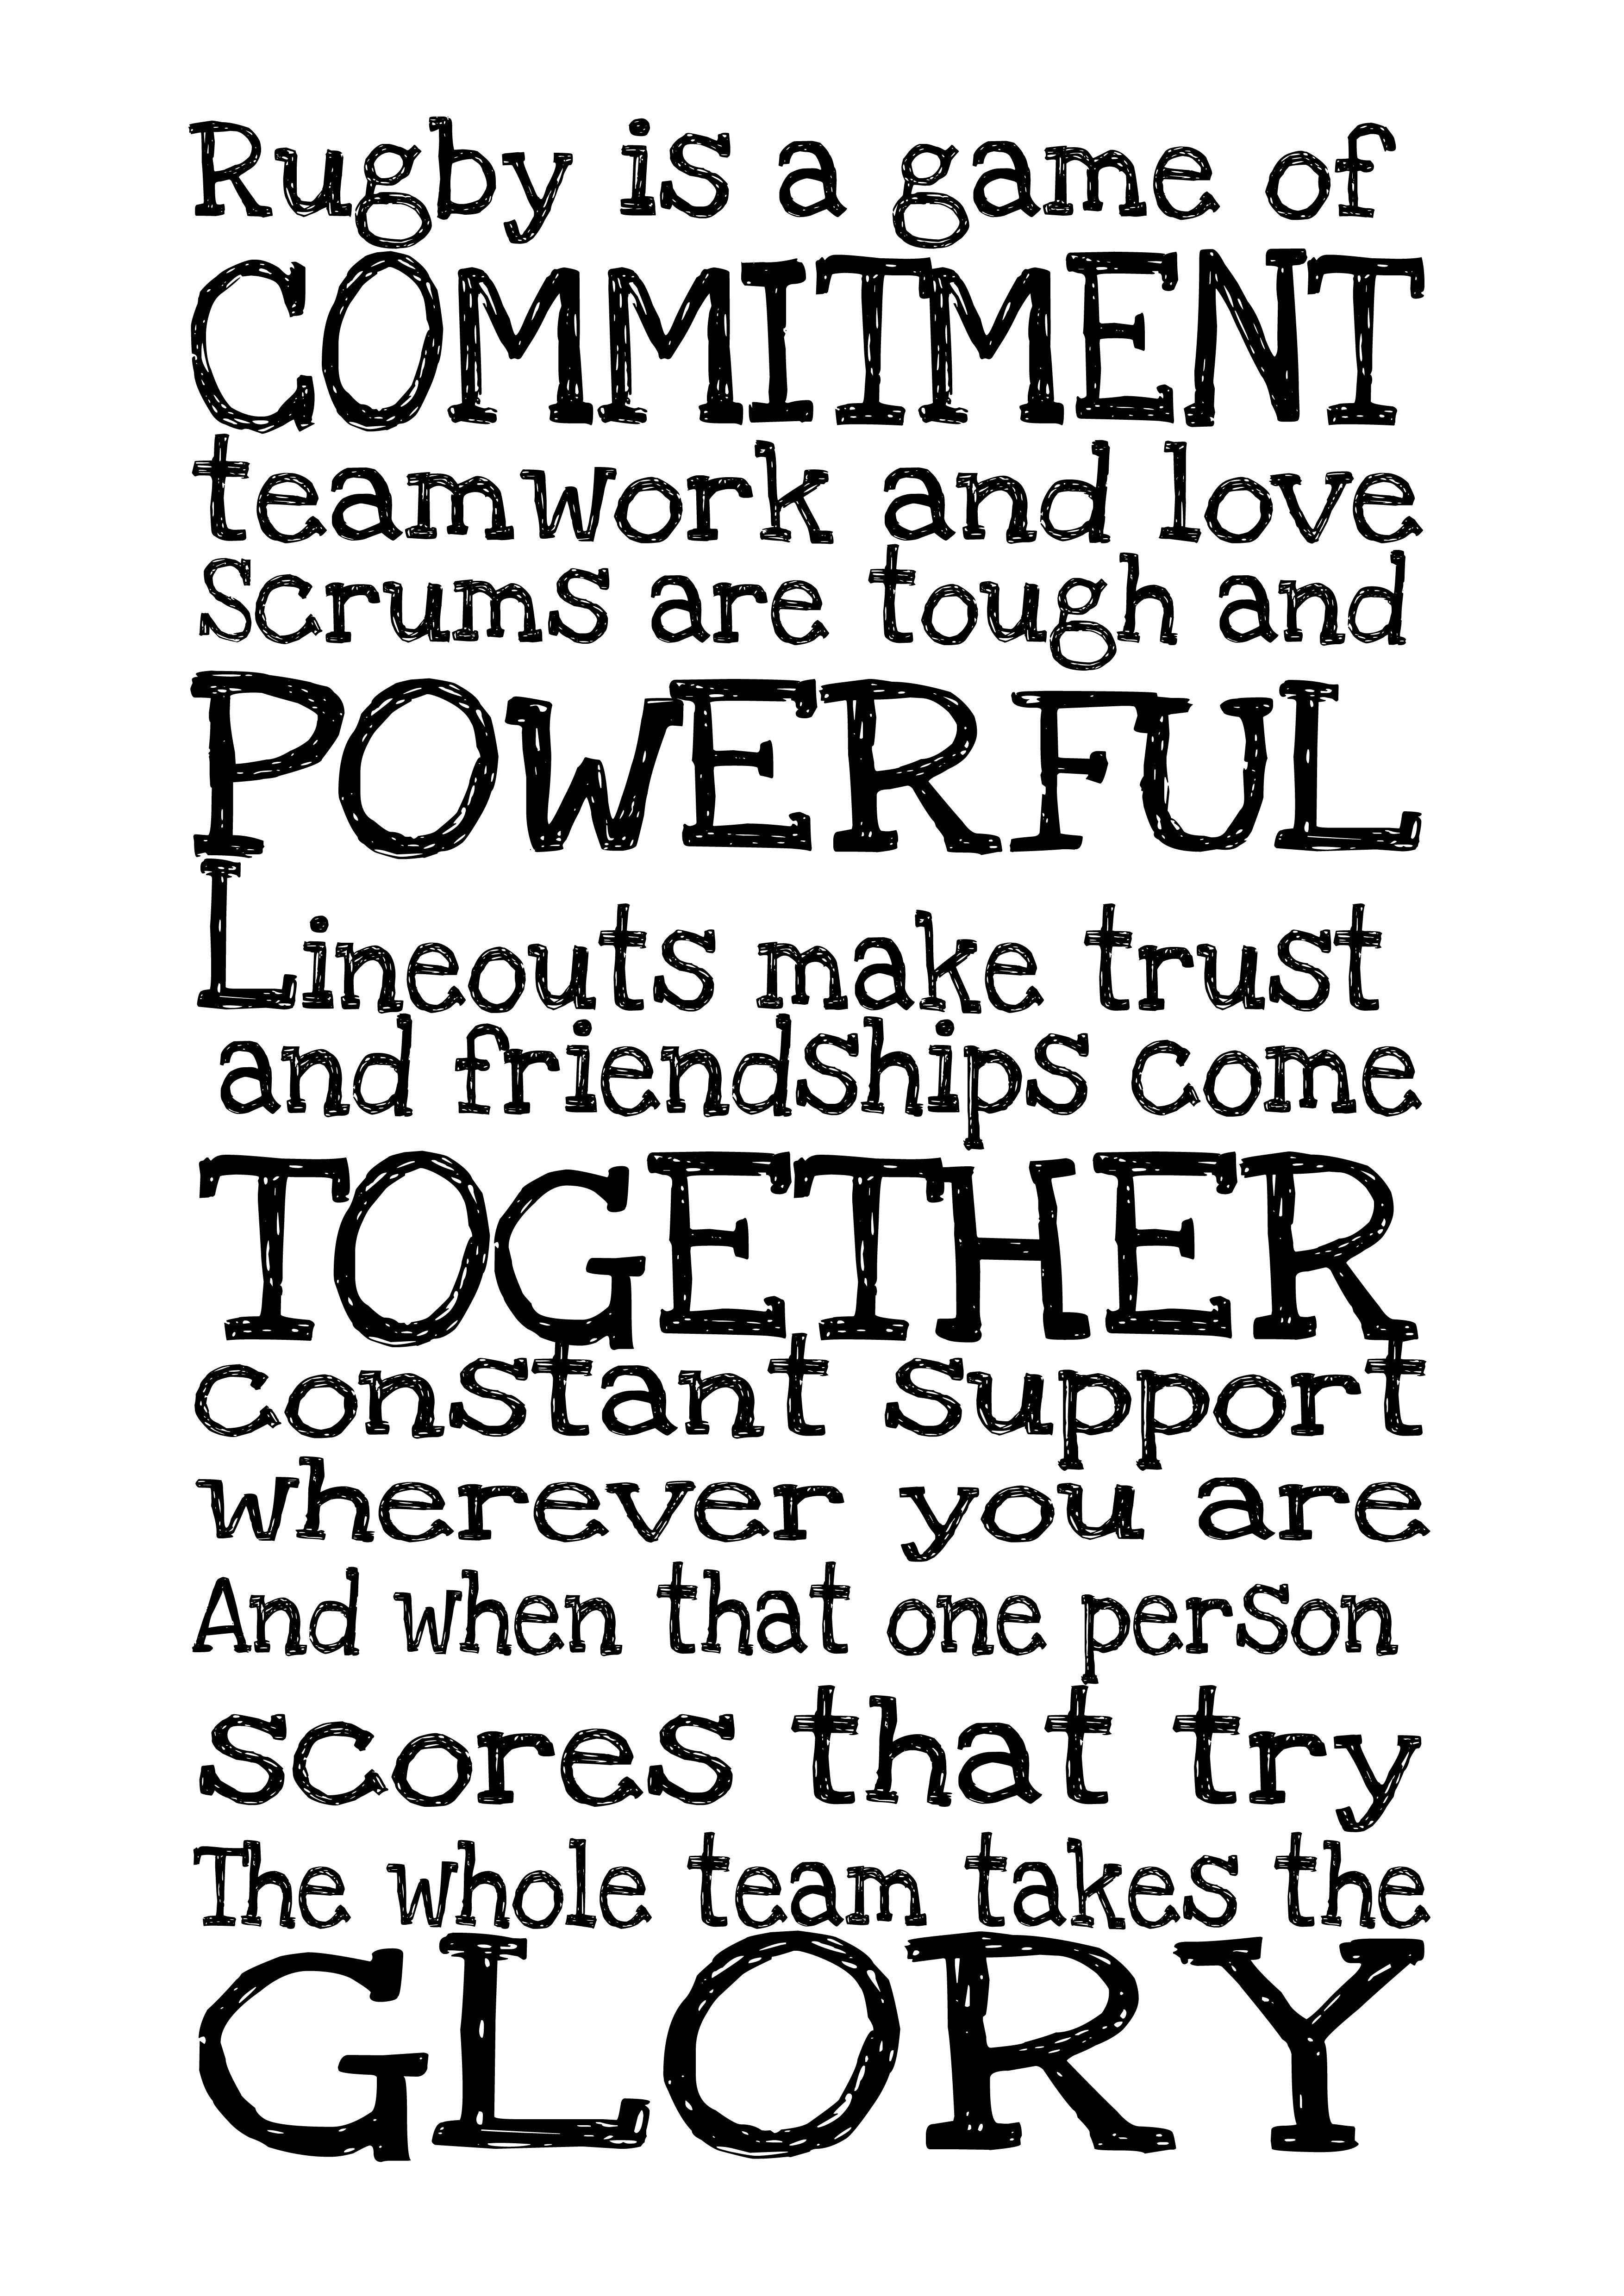 I Love Teams